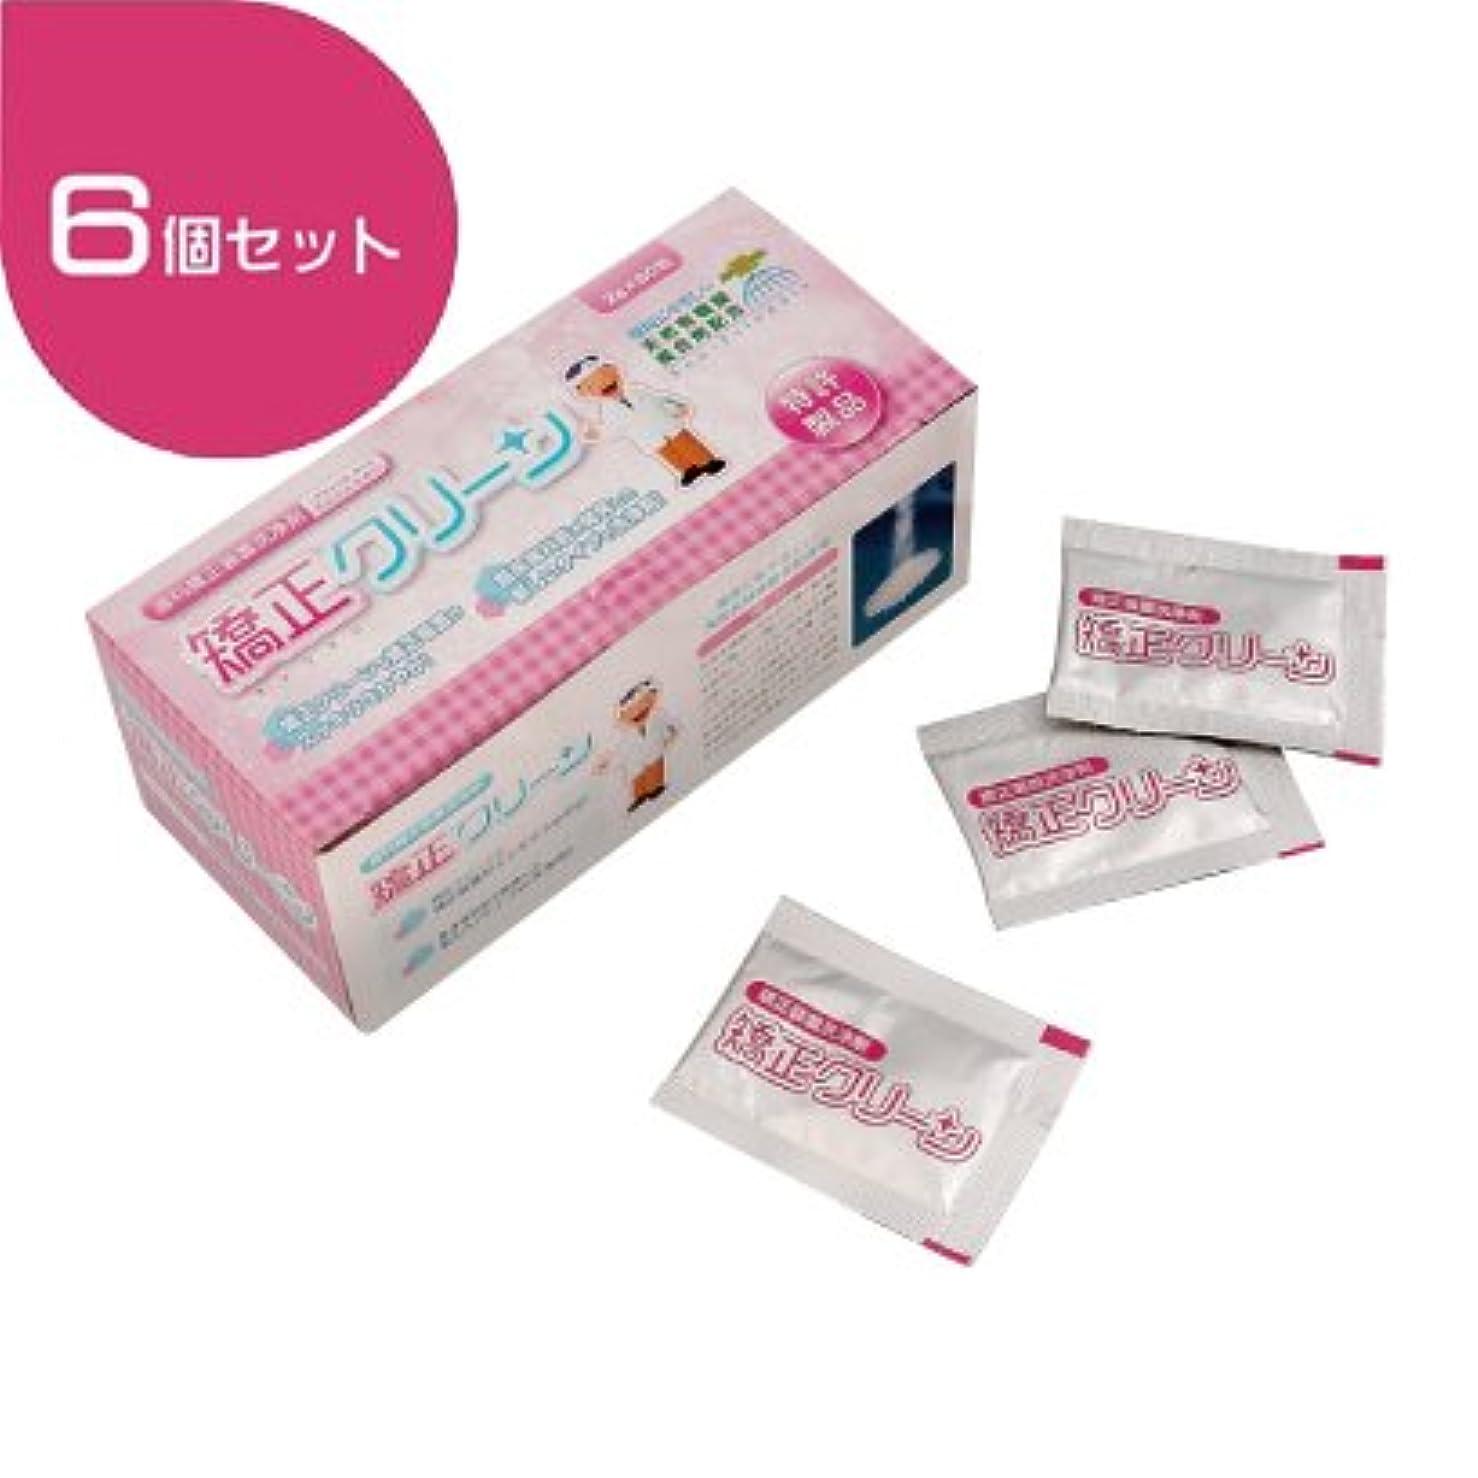 複合怒り前投薬矯正クリーン 1箱(2g×60包入り) × 6個 歯科矯正装置用洗浄剤